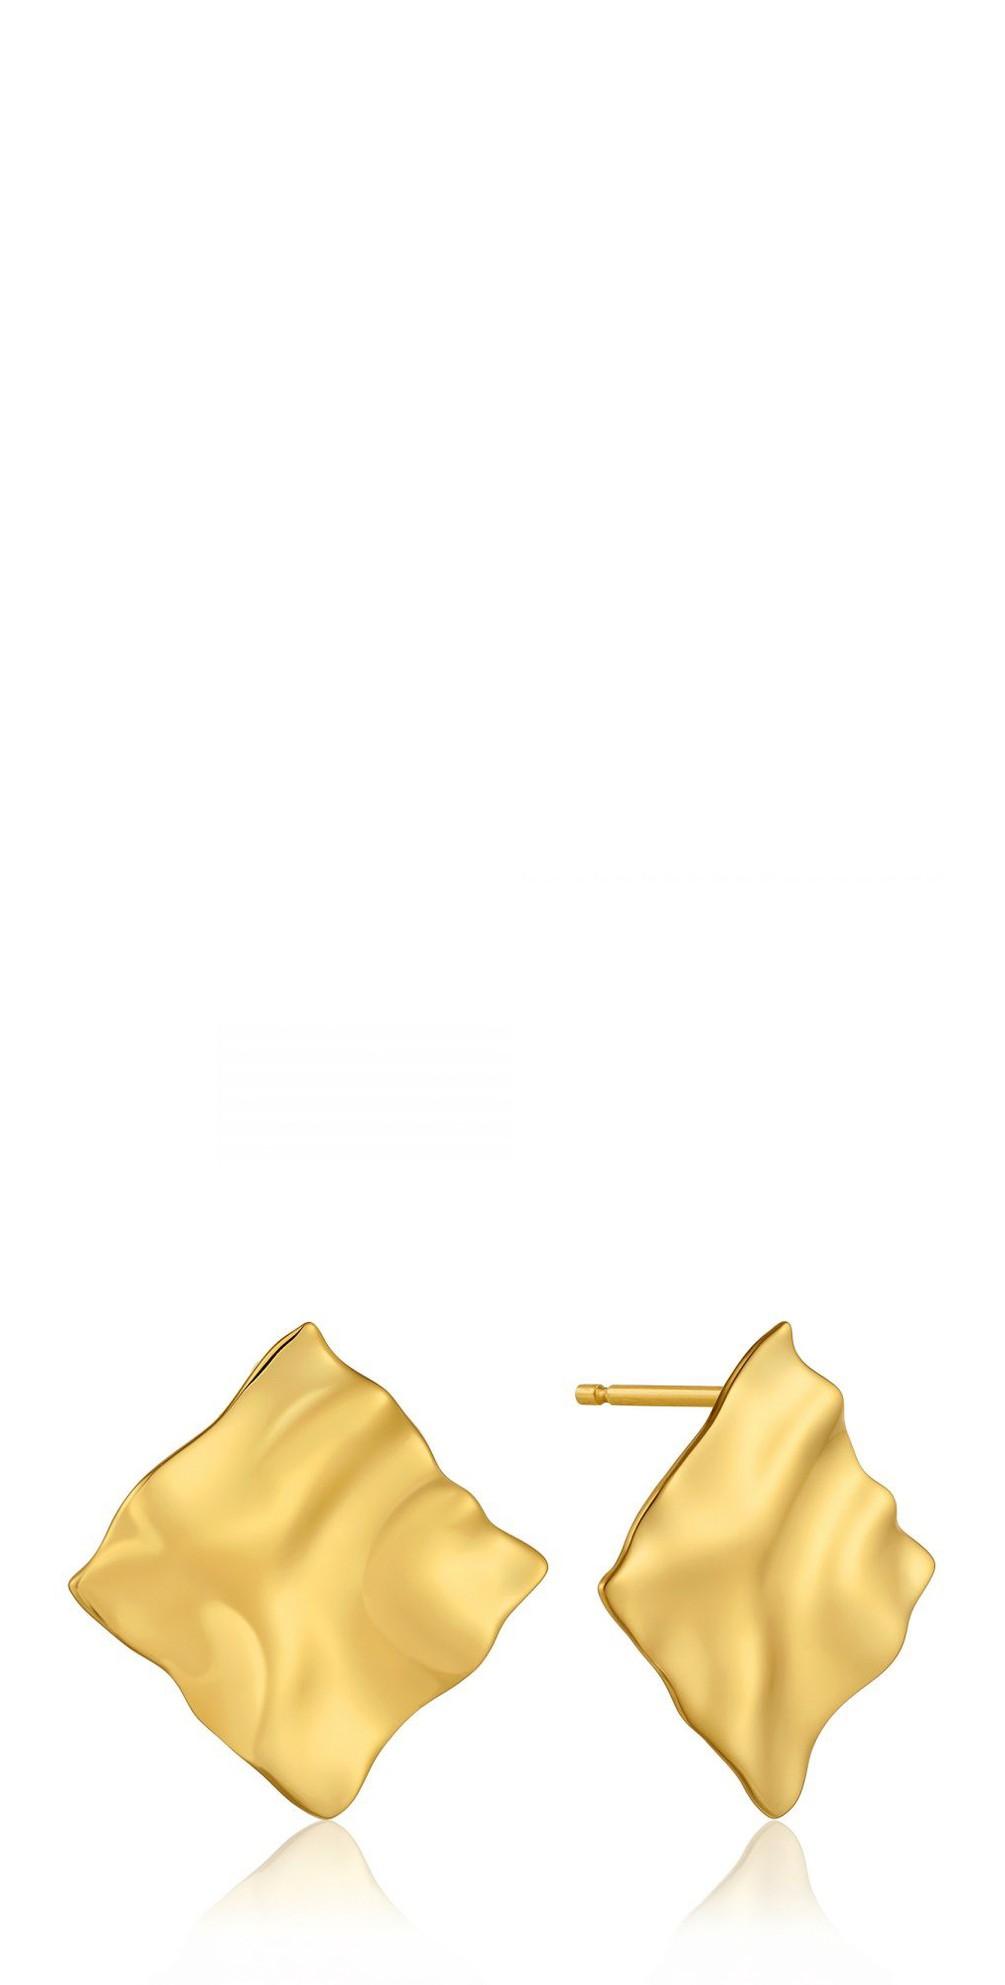 Crush Square Stud Earrings main image